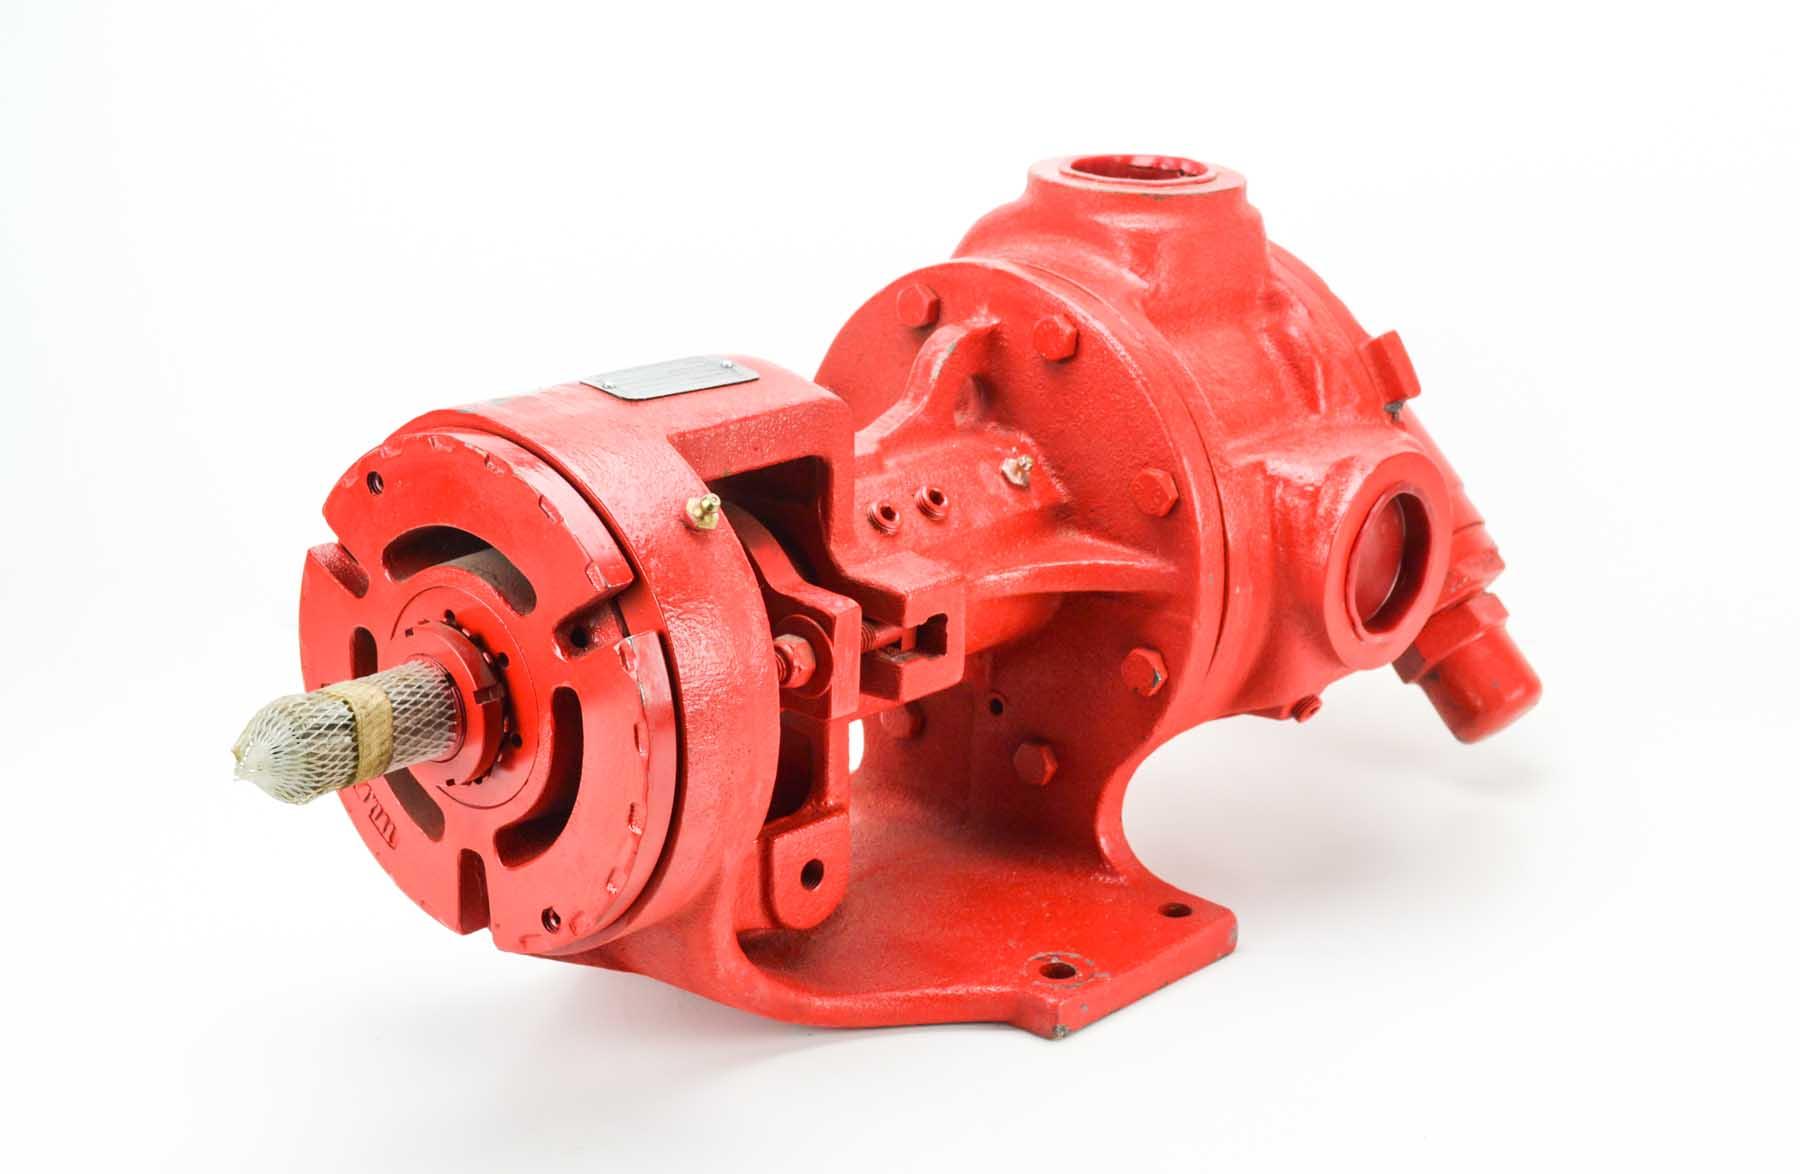 Spectrom SG-11014 Pump